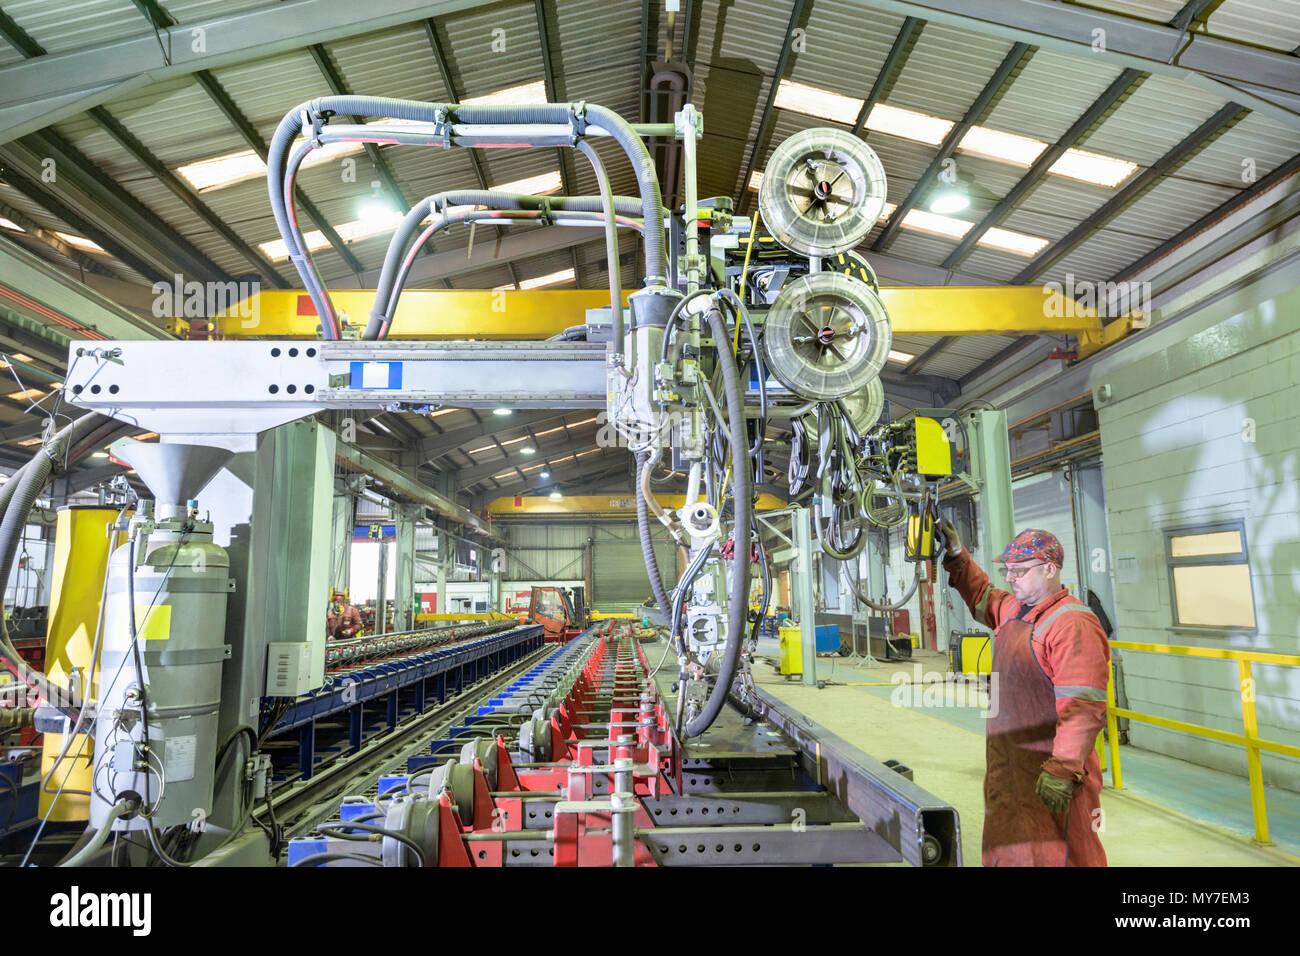 Worker operating beam welding machine in trailer factory - Stock Image